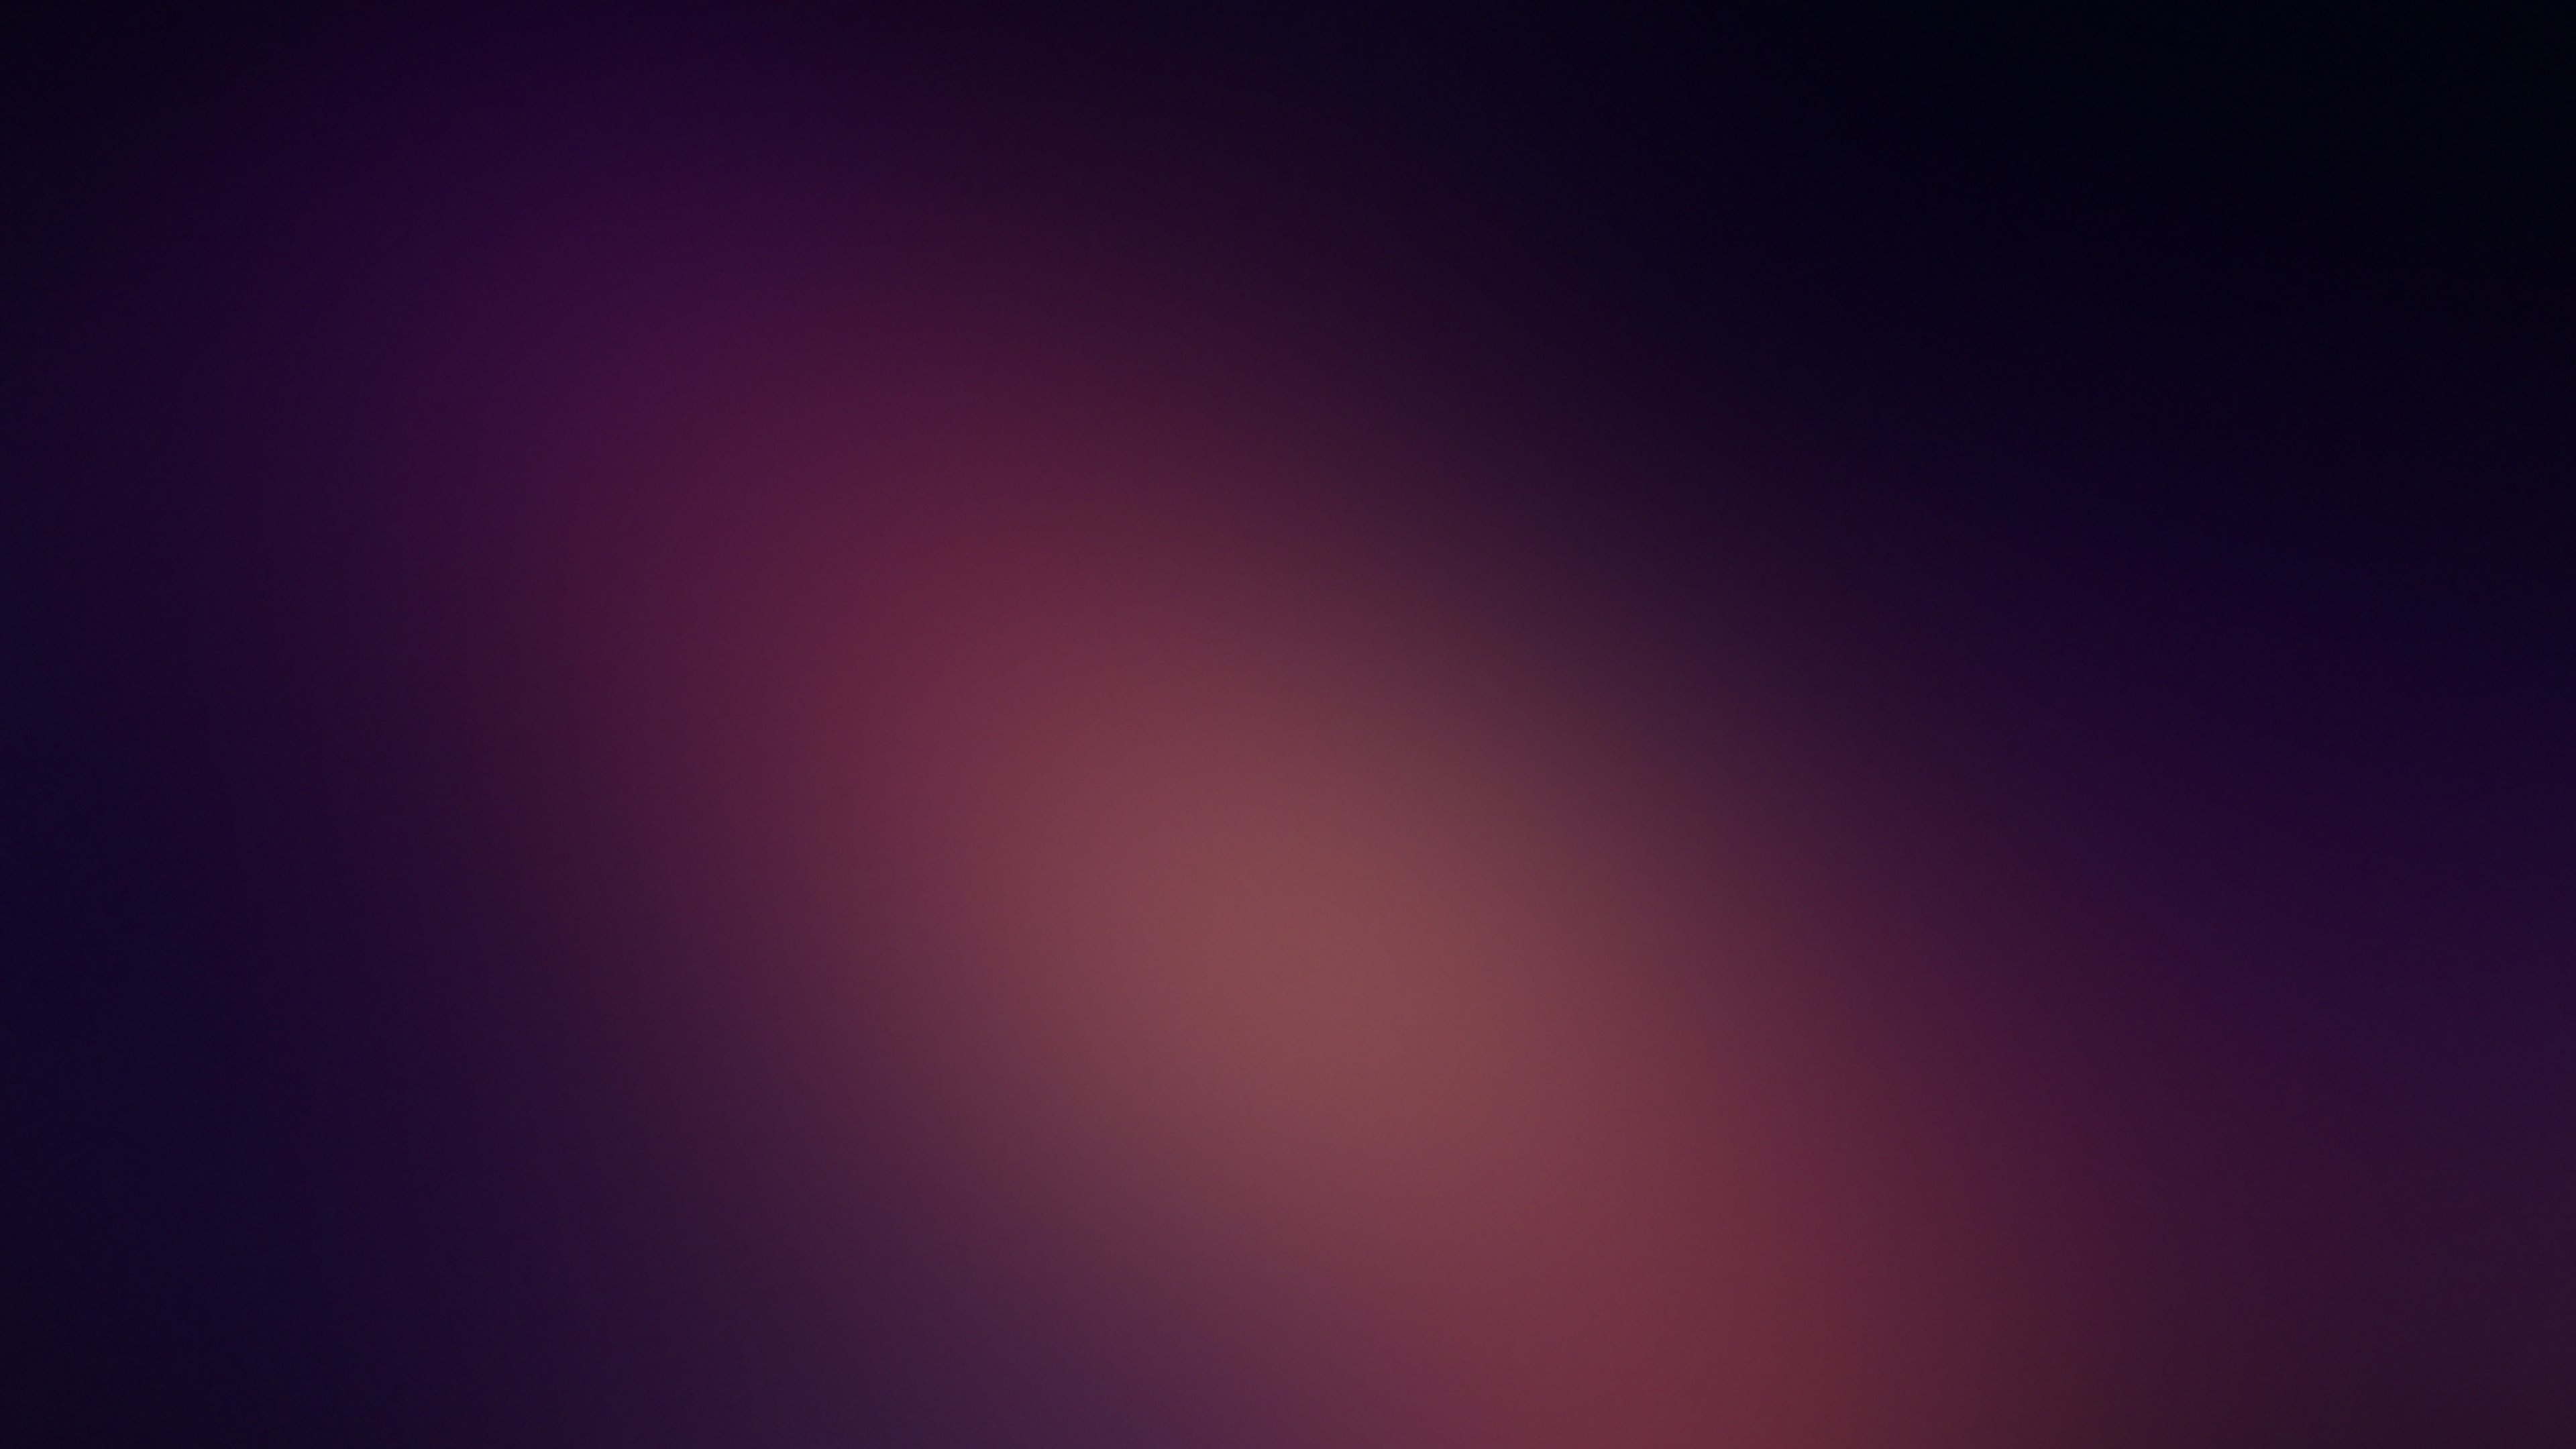 dark minimalist blur 4k 1539371551 - Dark Minimalist Blur 4k - minimalist wallpapers, minimalism wallpapers, hd-wallpapers, deviantart wallpapers, dark wallpapers, blur wallpapers, abstract wallpapers, 4k-wallpapers